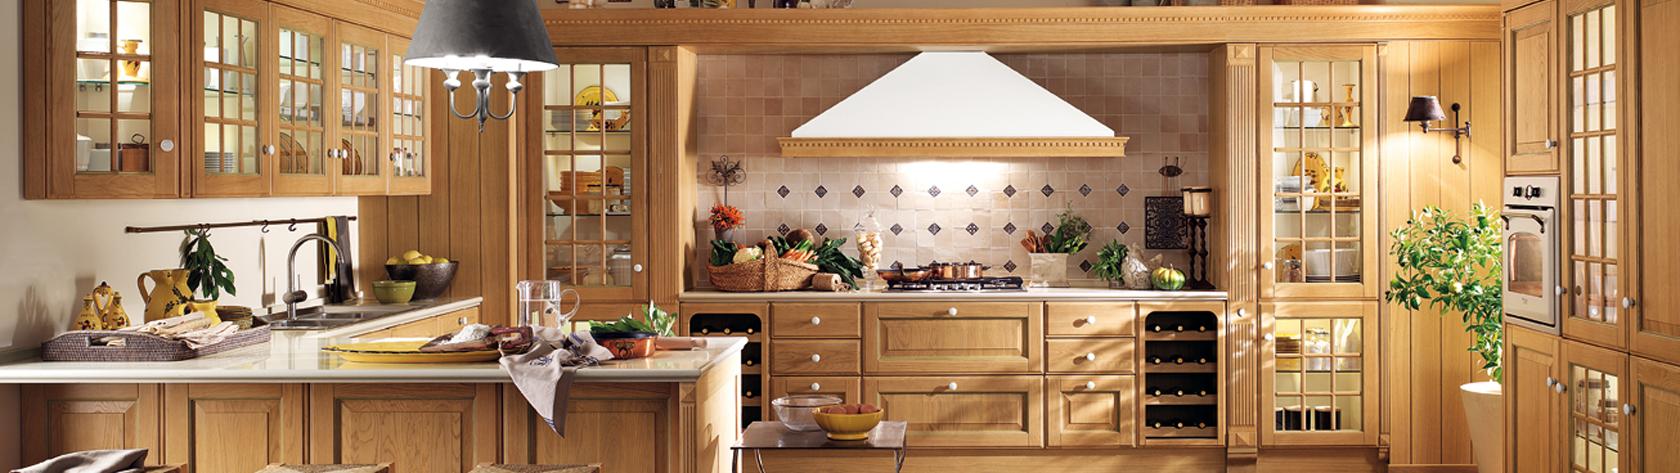 Vendita Cucine Classiche e Moderne Scavolini a Enna